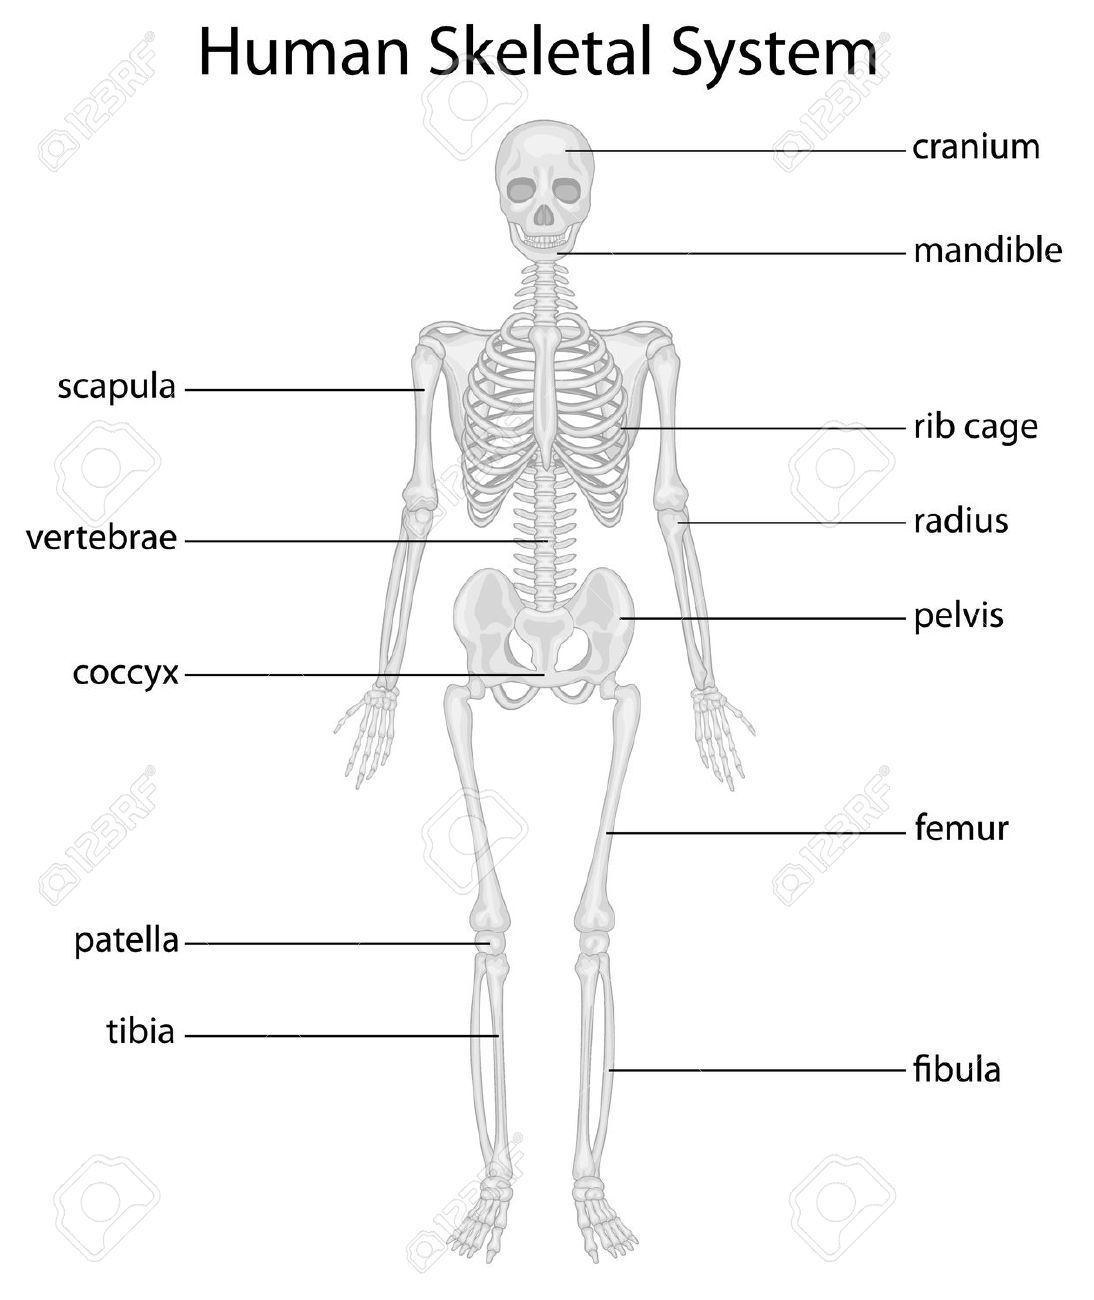 medium resolution of body skeleton diagram without labels skeletal system diagram without labels label long bone diagram